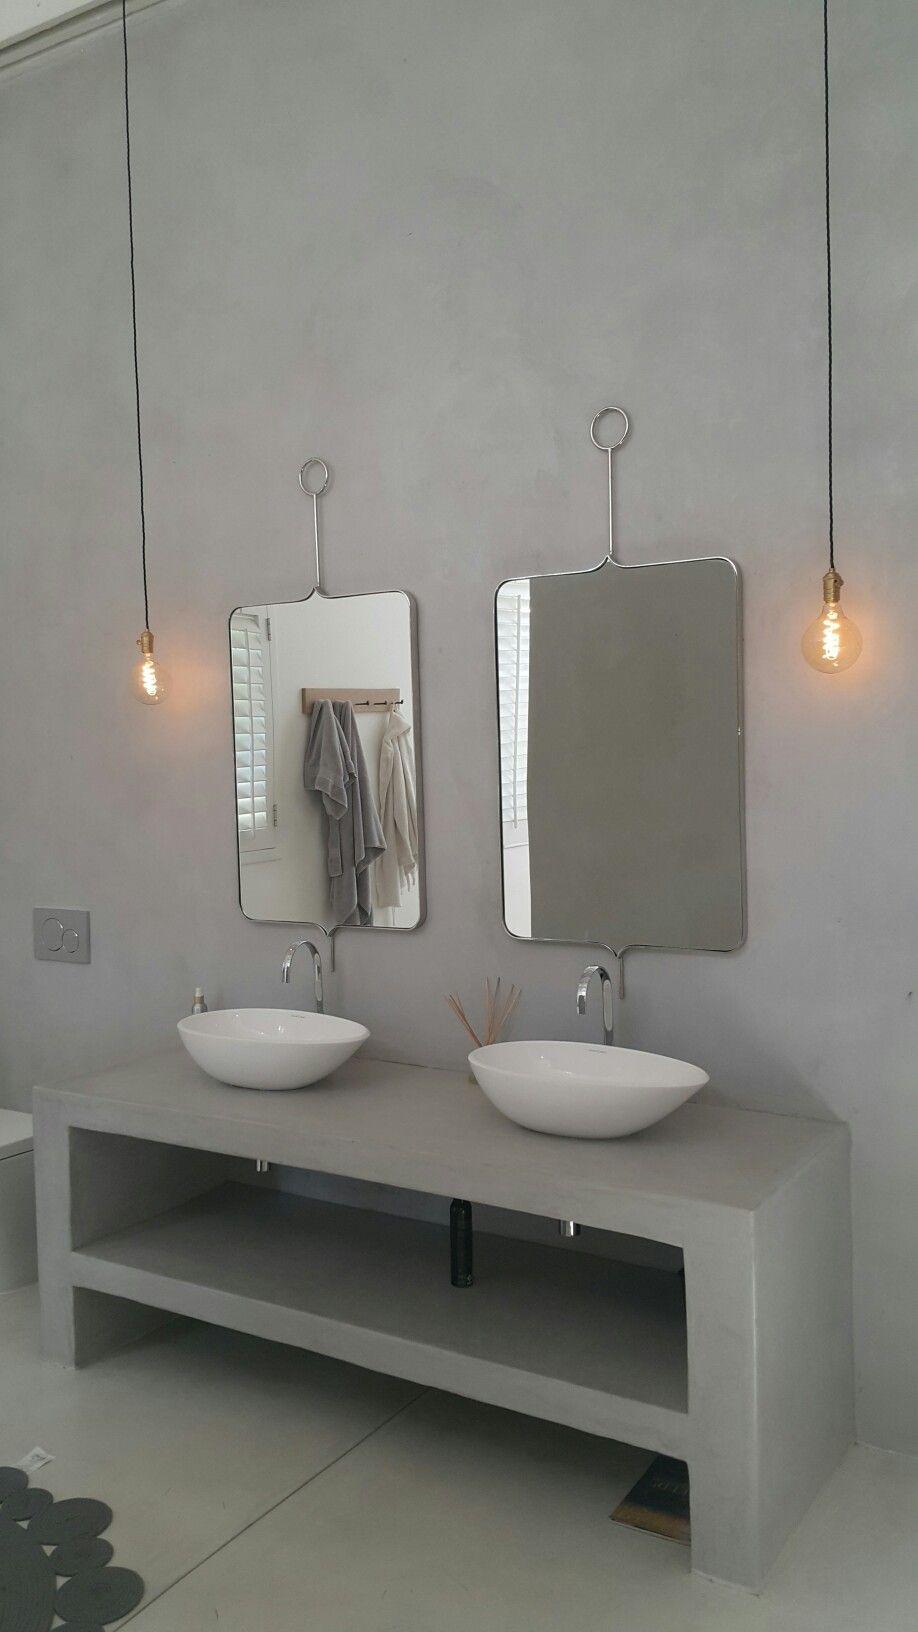 Beautiful Bathroom Cement Floors Walls Vanity Www Cherubinos Co Za Wall Vanity Beautiful Bathrooms Cement Furniture